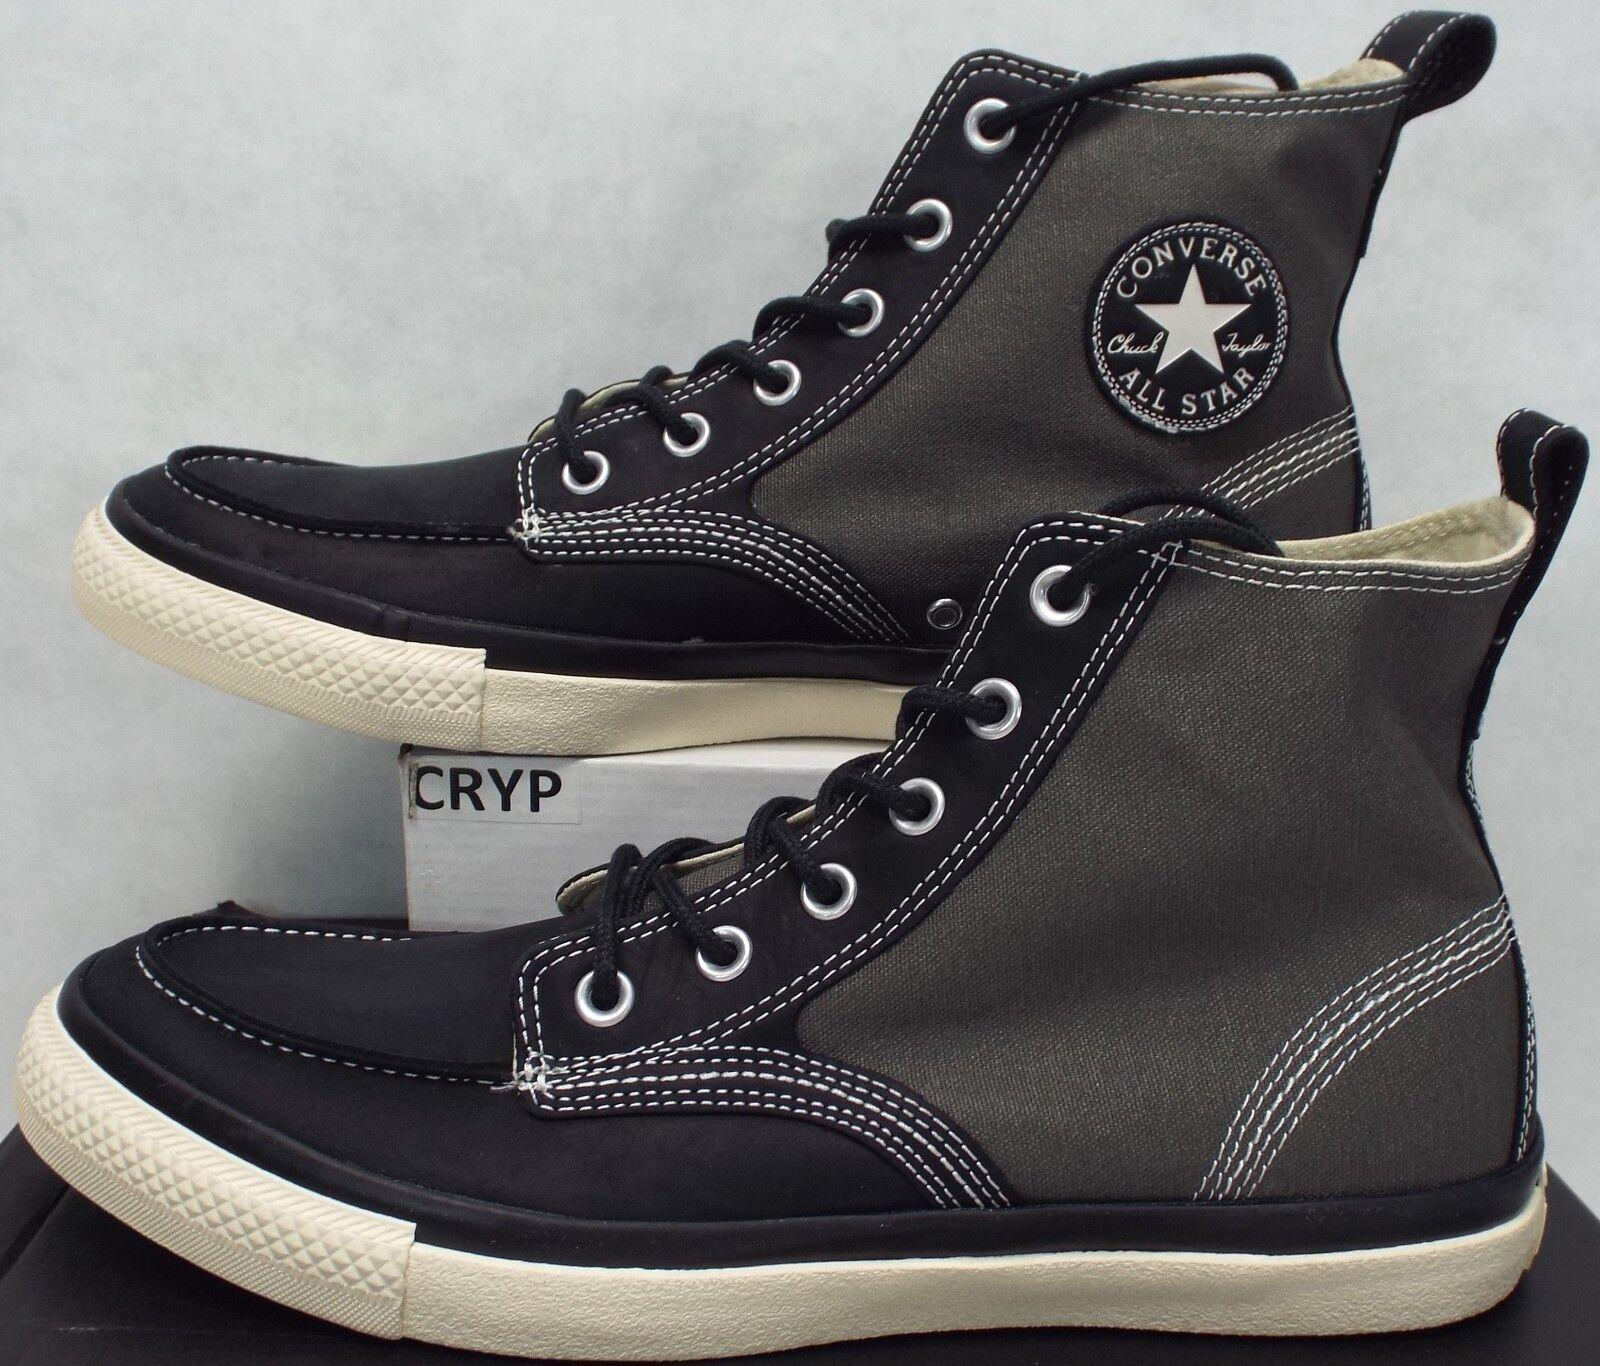 New Homme 11.5 Converse CTAS Classic B Charcoal Noir Canvas Chaussures  70 135258C